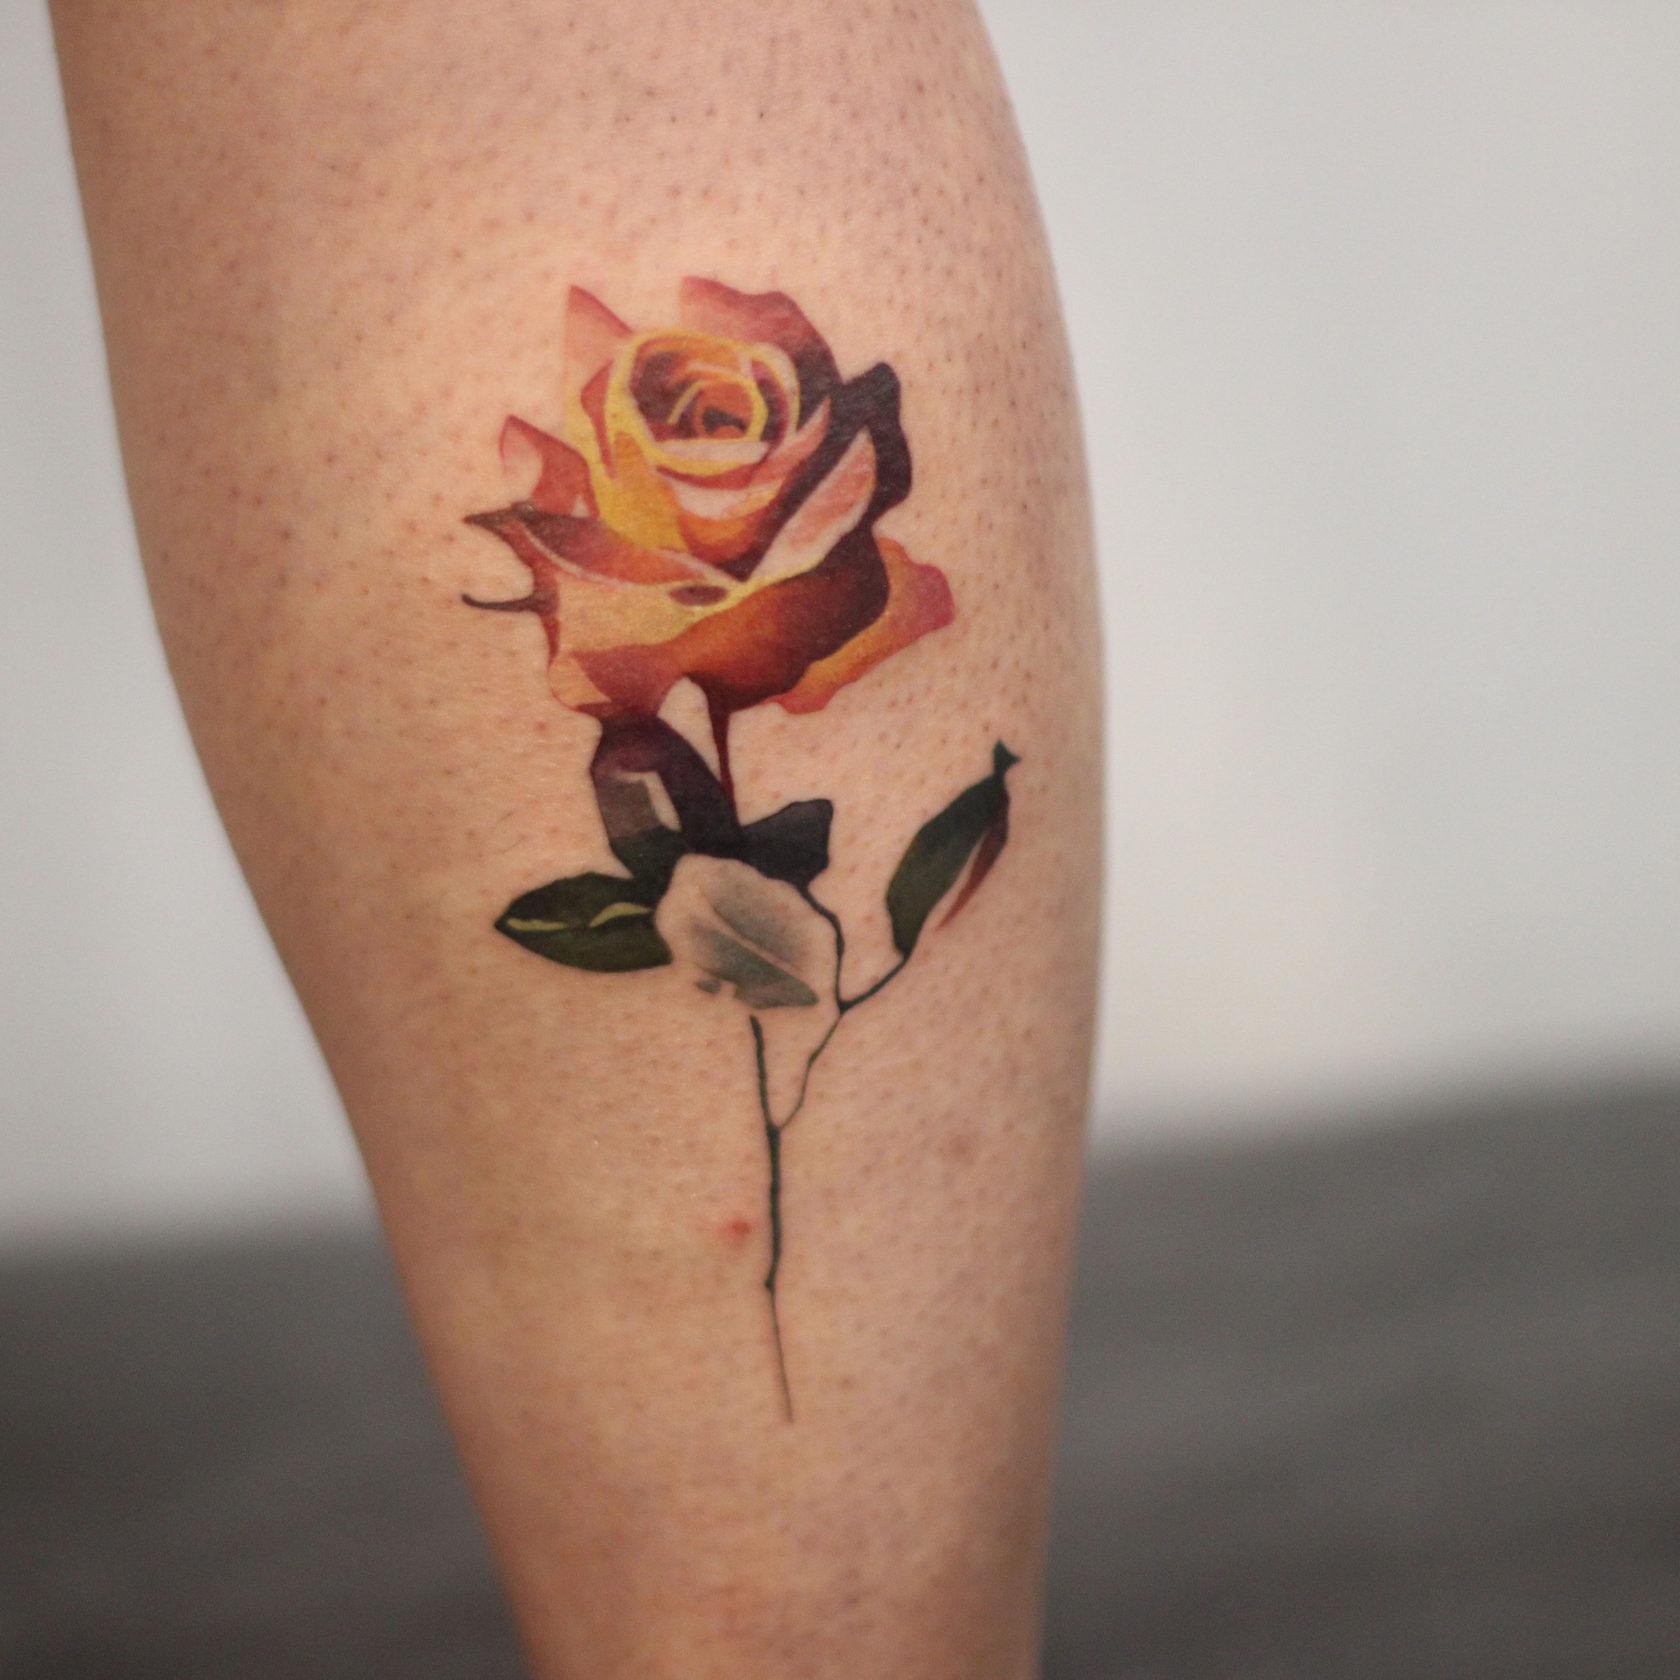 цветок на икре, тату на икре, тату на голене, тату салоны в москве, тату салон цена, цена татуировки в москве, тату стоимость, татуировка цена москва, тату салоны в москве цены